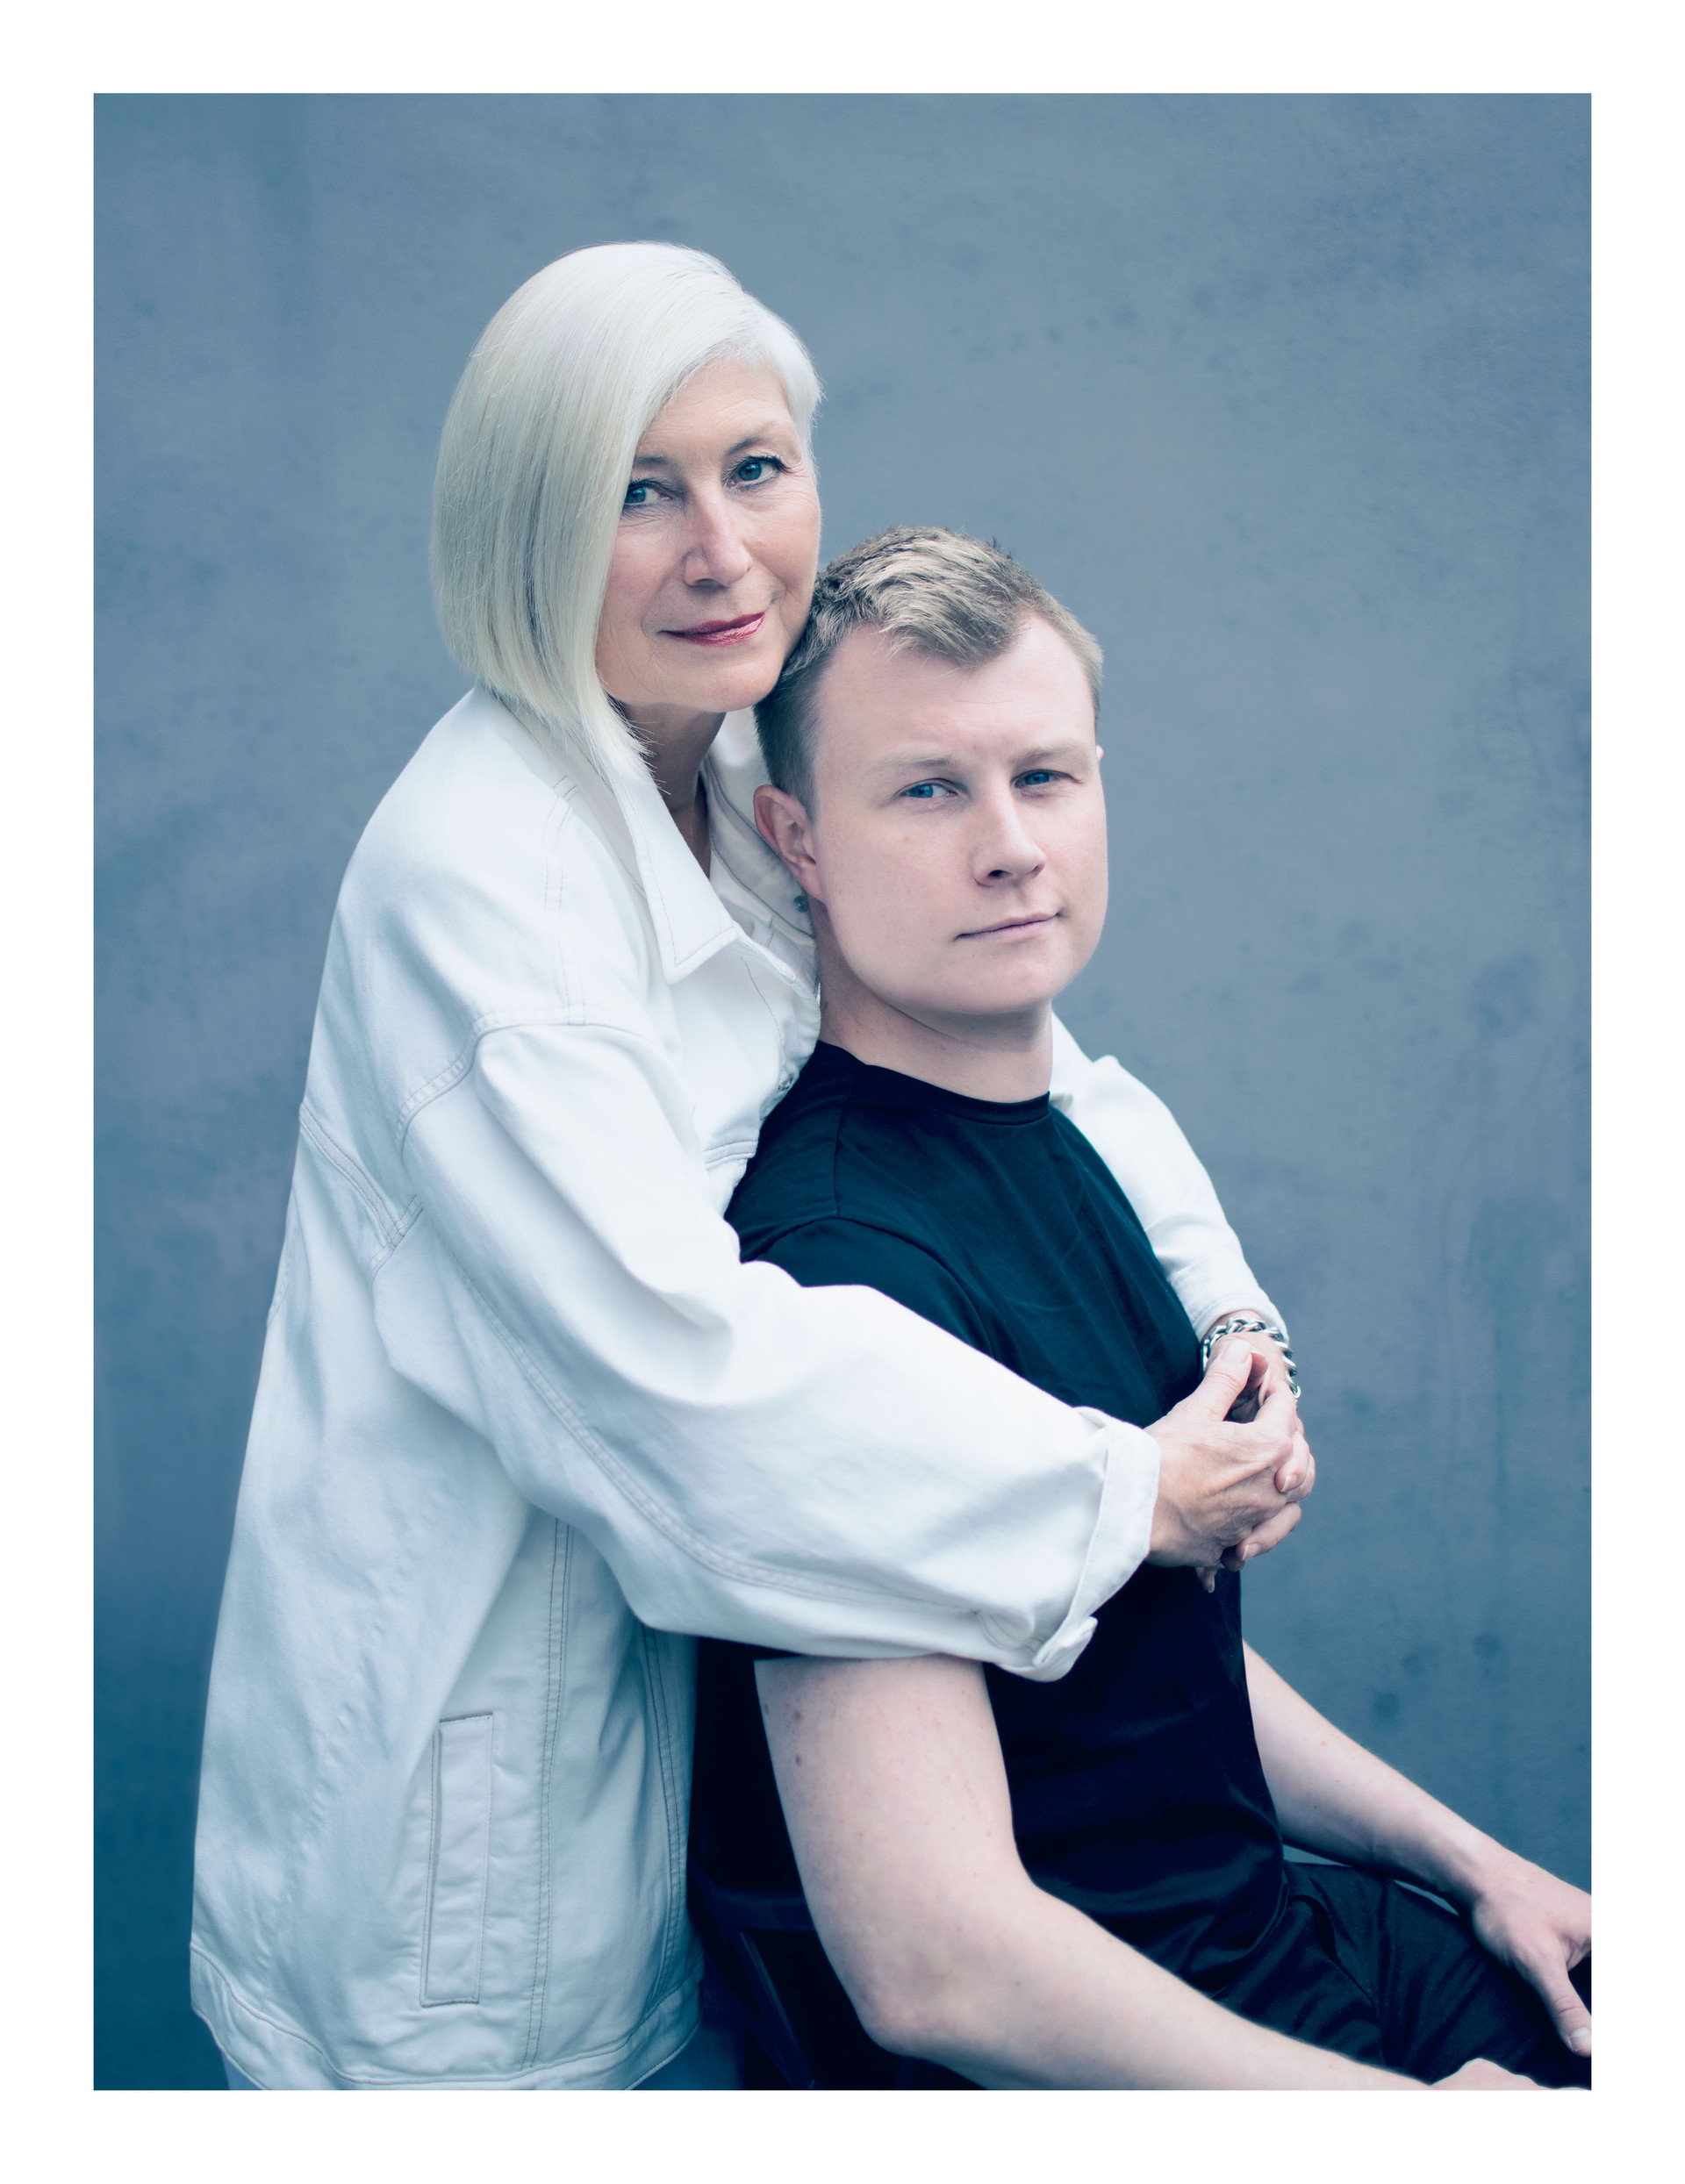 Shan and Rhys-Owen Fisher - East Dulwich, 2020